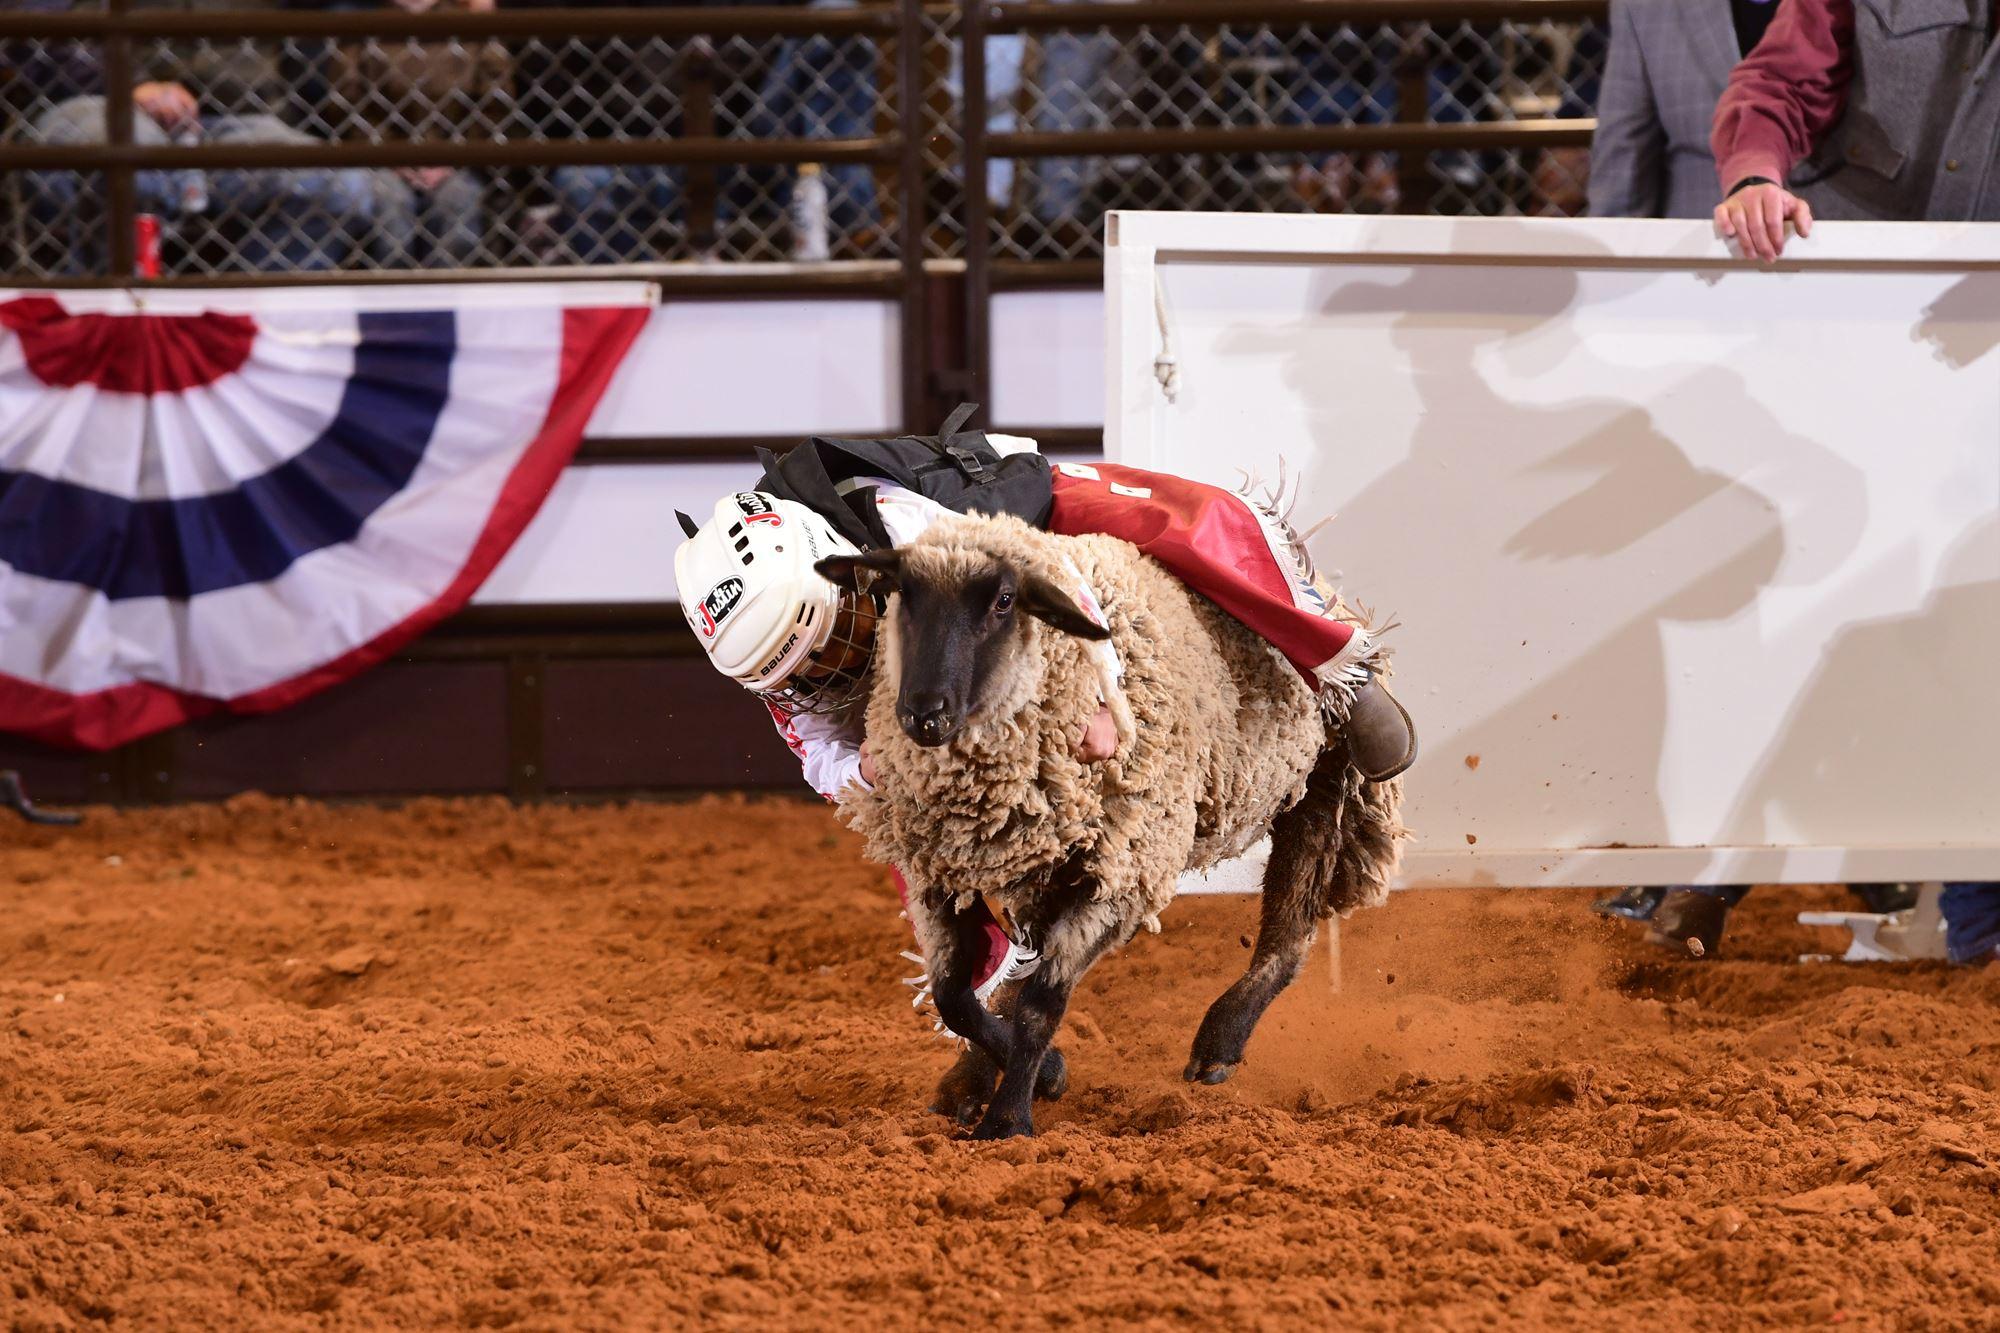 Ranch Rodeo - Jan. 17 - ENTRIES FULL